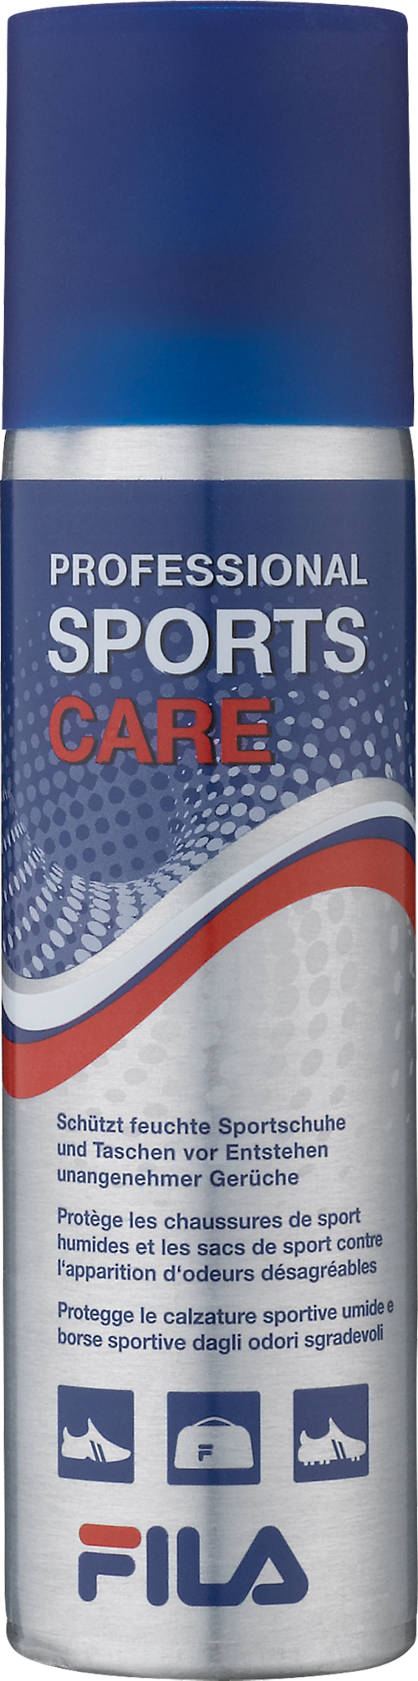 Fila Proffessional Sports Care